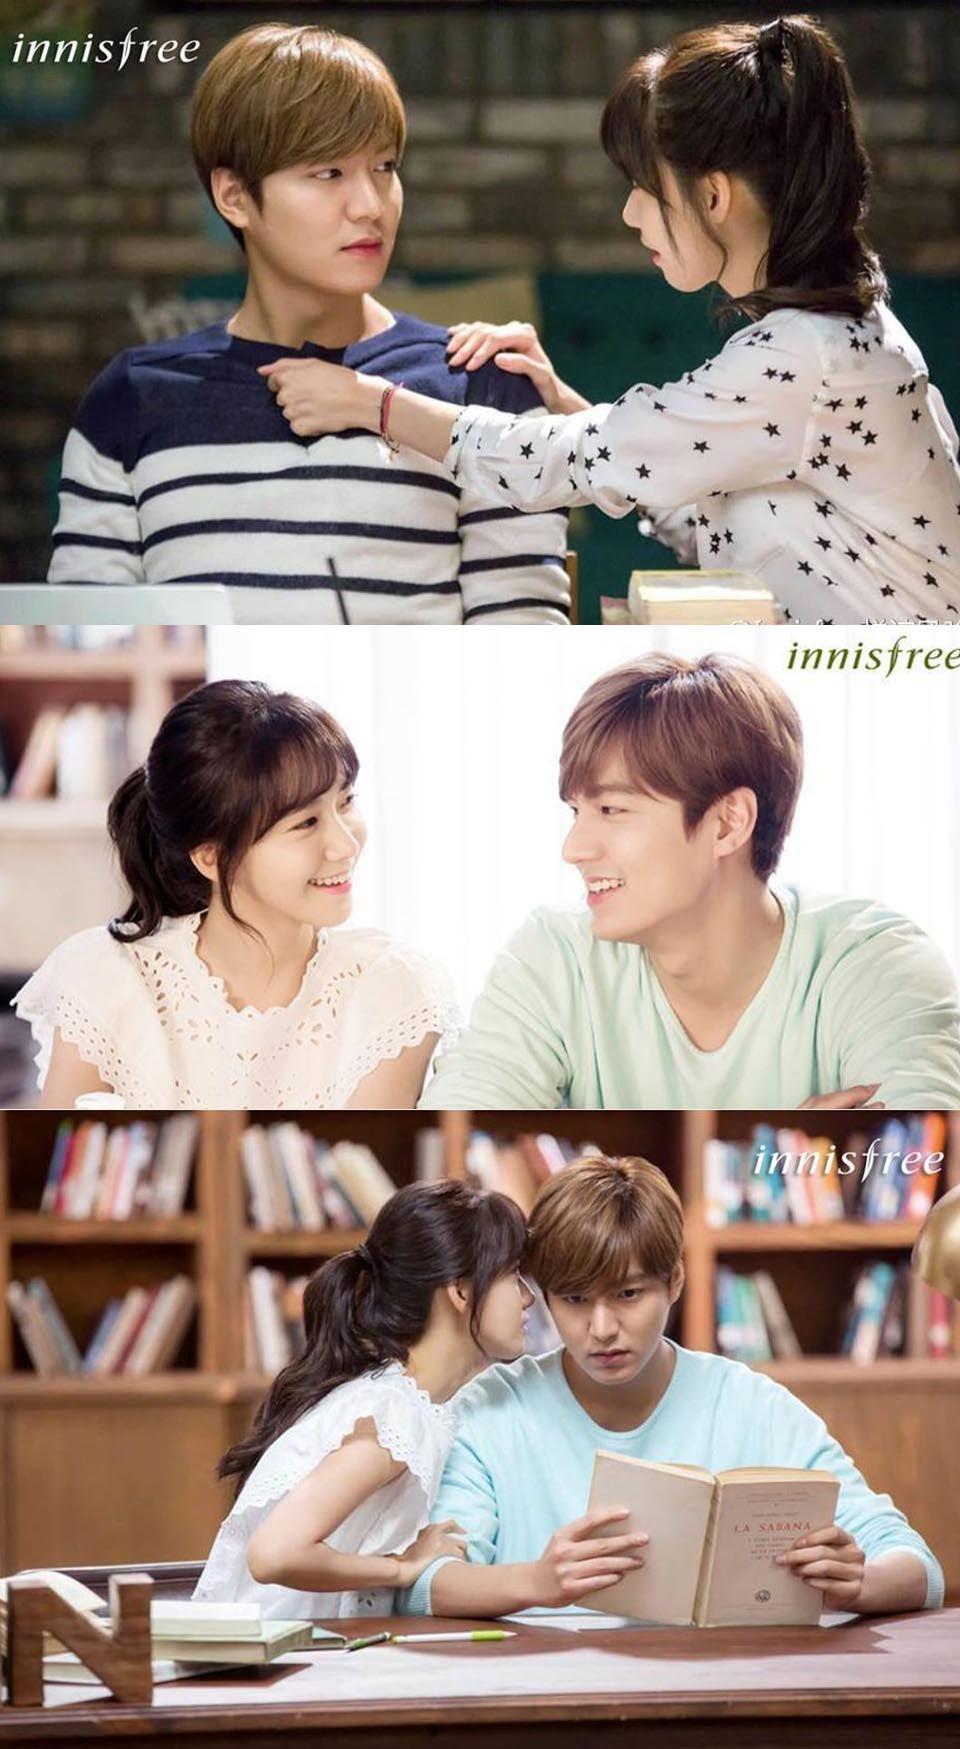 Yoona and lee min ho dating history